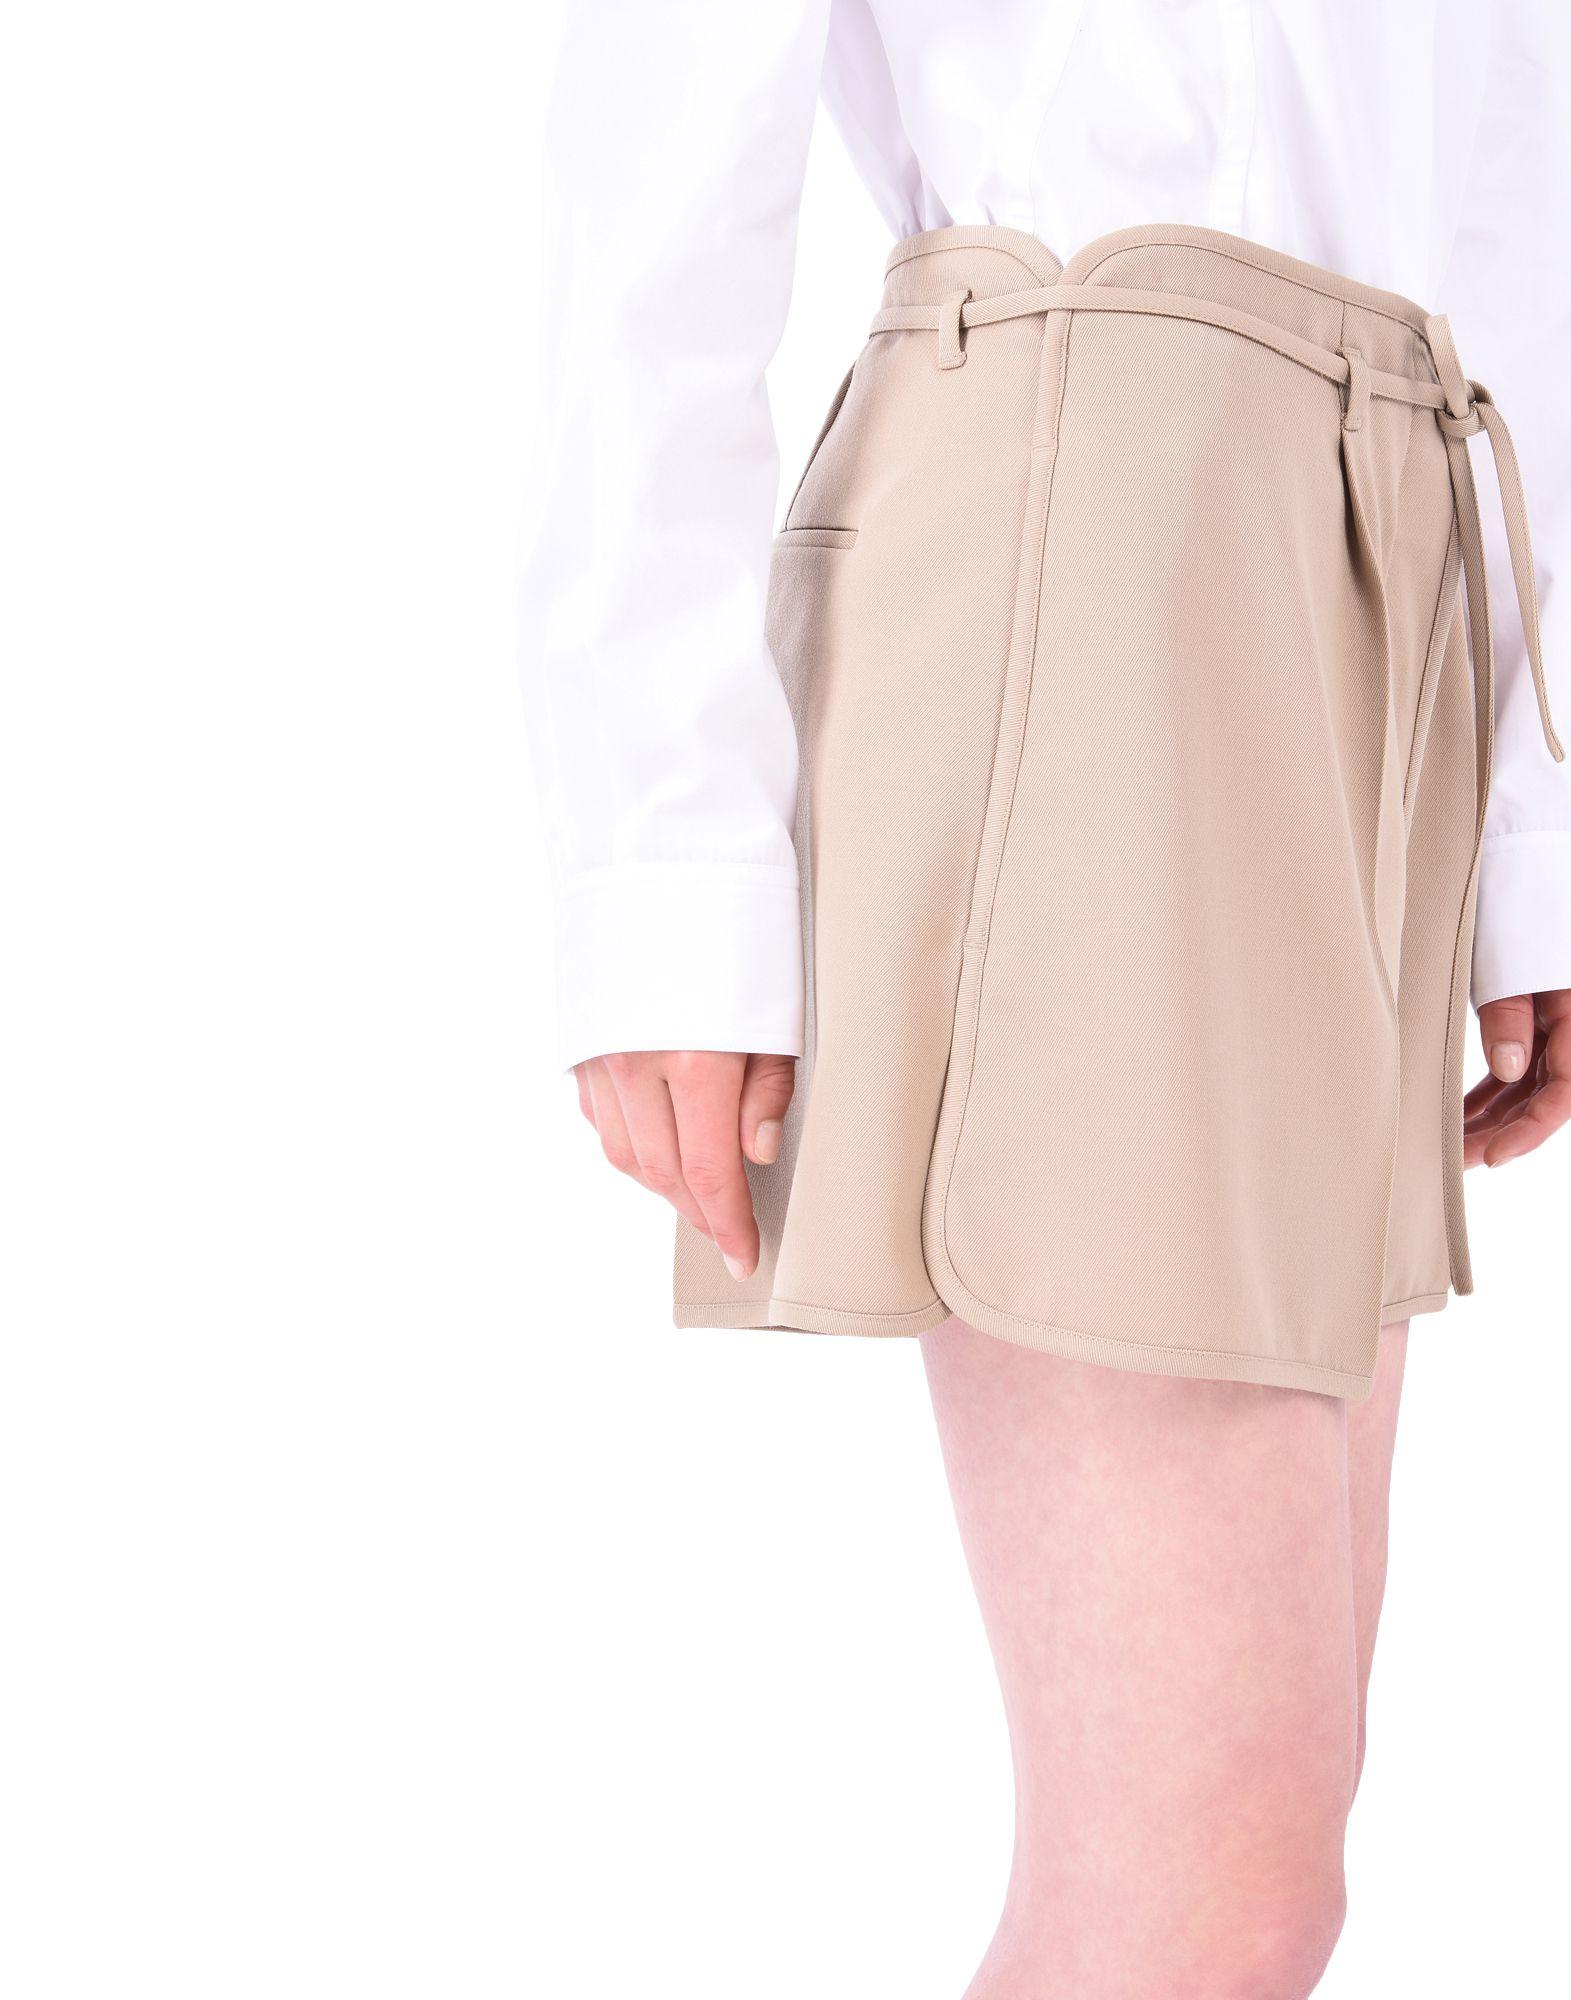 Bermuda shorts - JIL SANDER Online Store